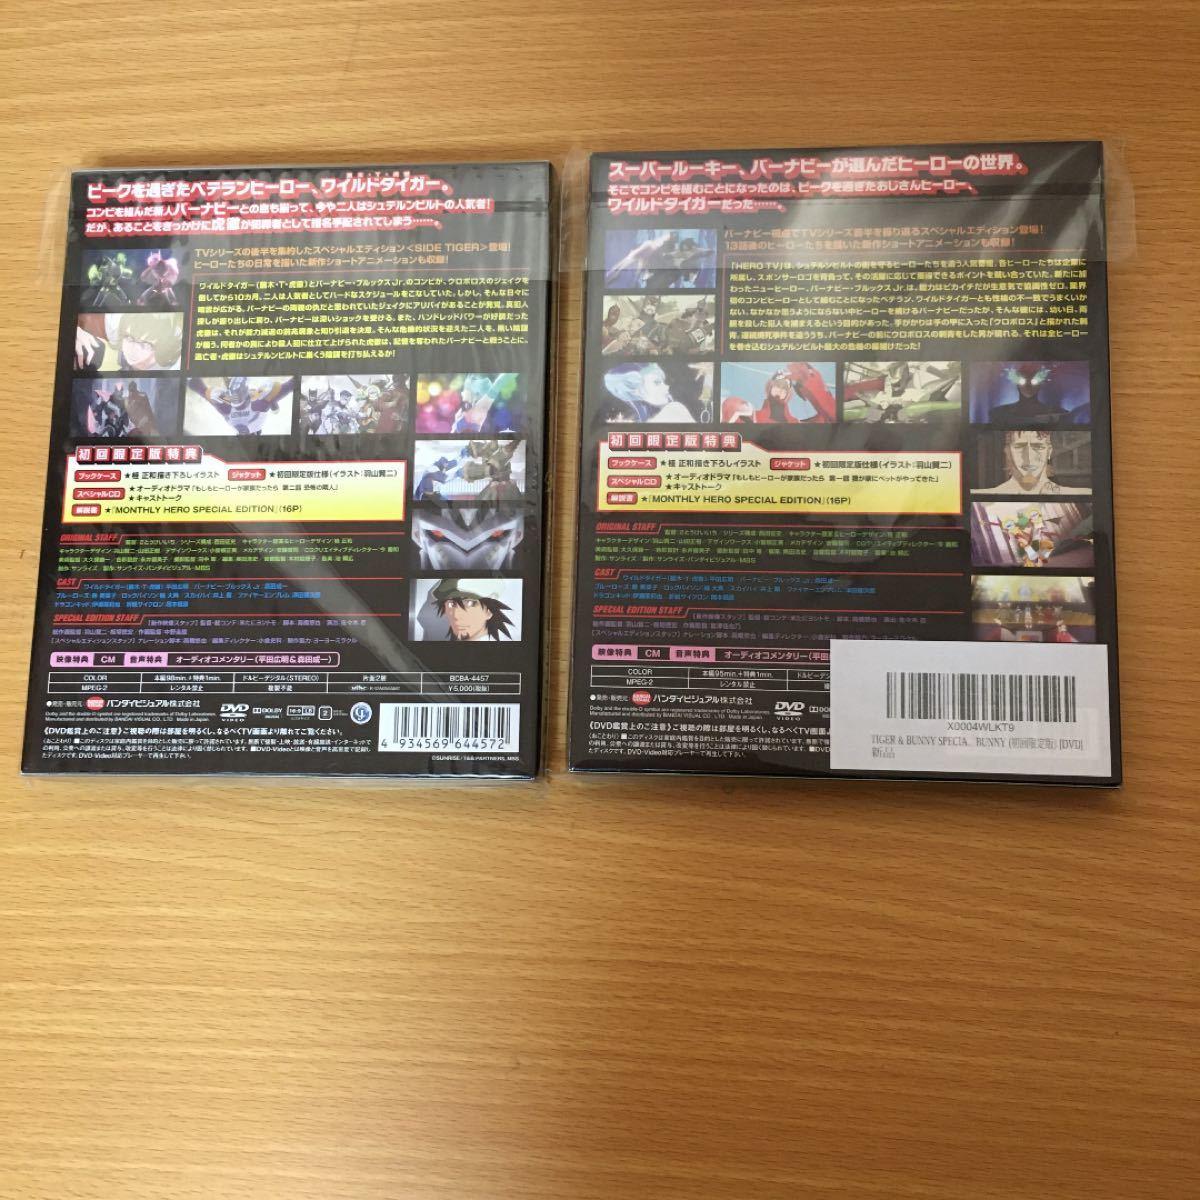 TIGER&BUNNY 初回限定版 Blu-ray